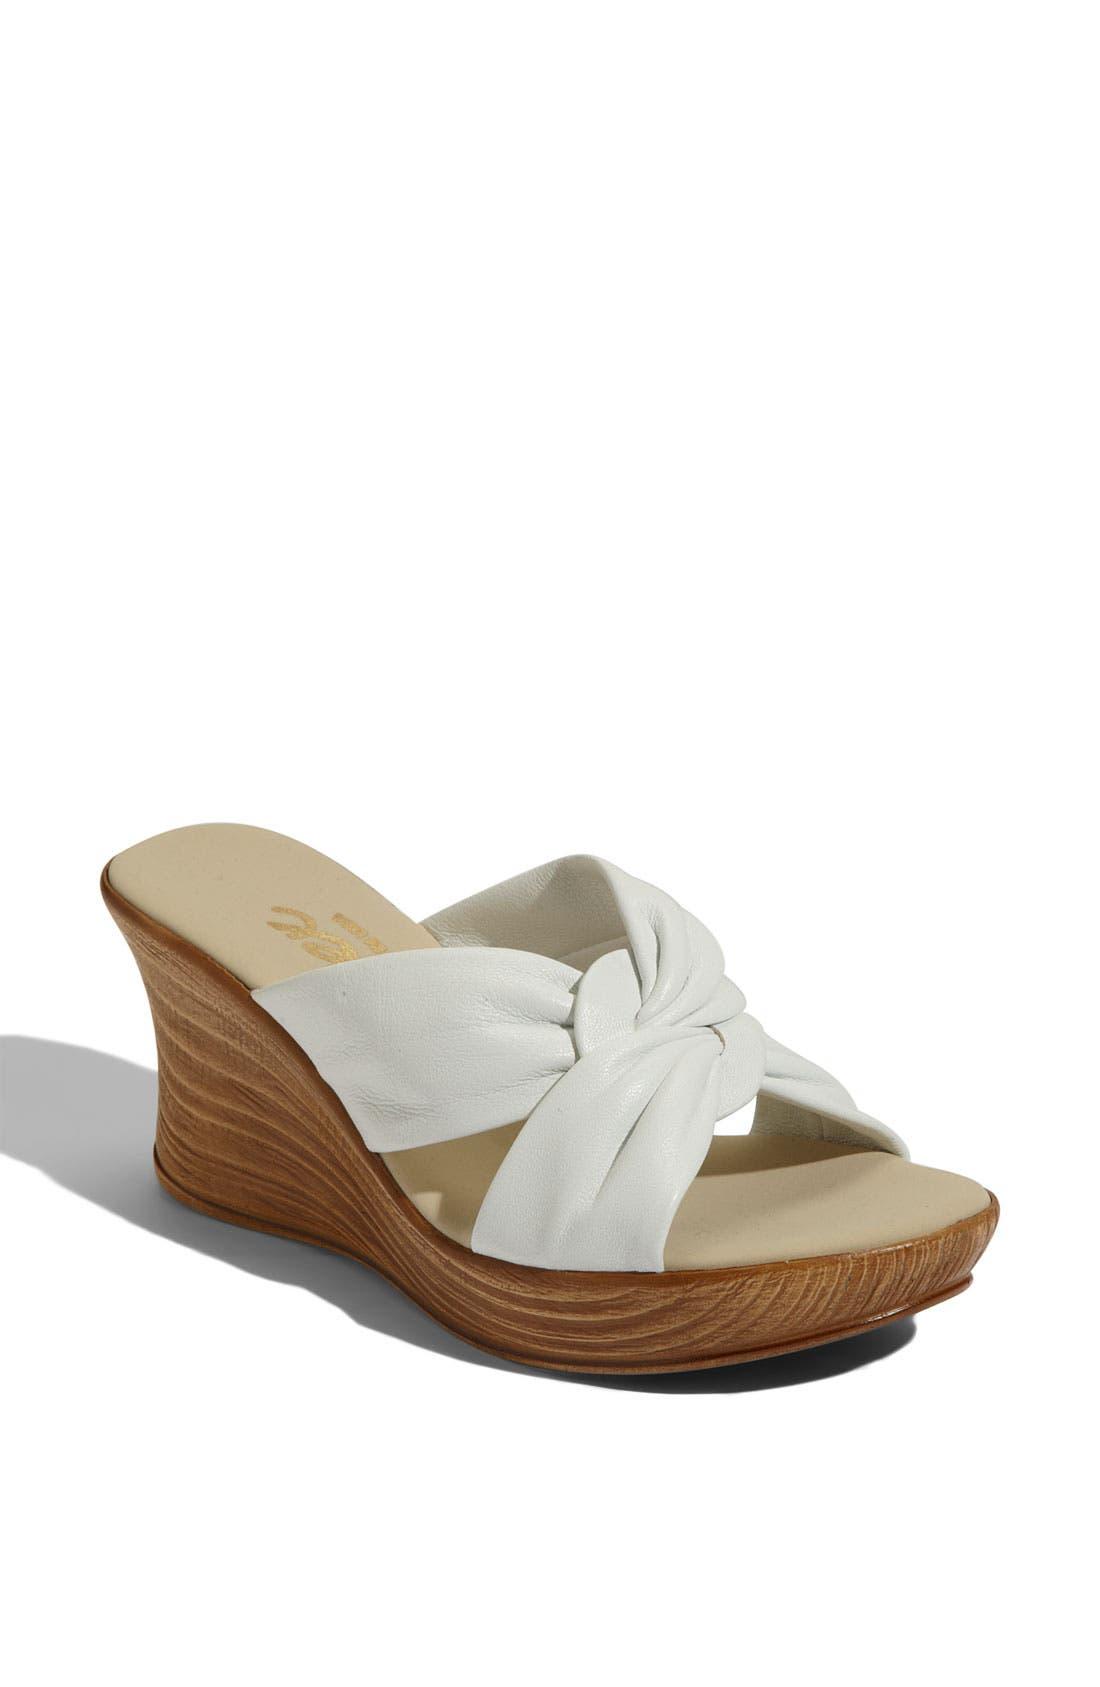 Alternate Image 1 Selected - Onex 'Puffy' Platform Sandal